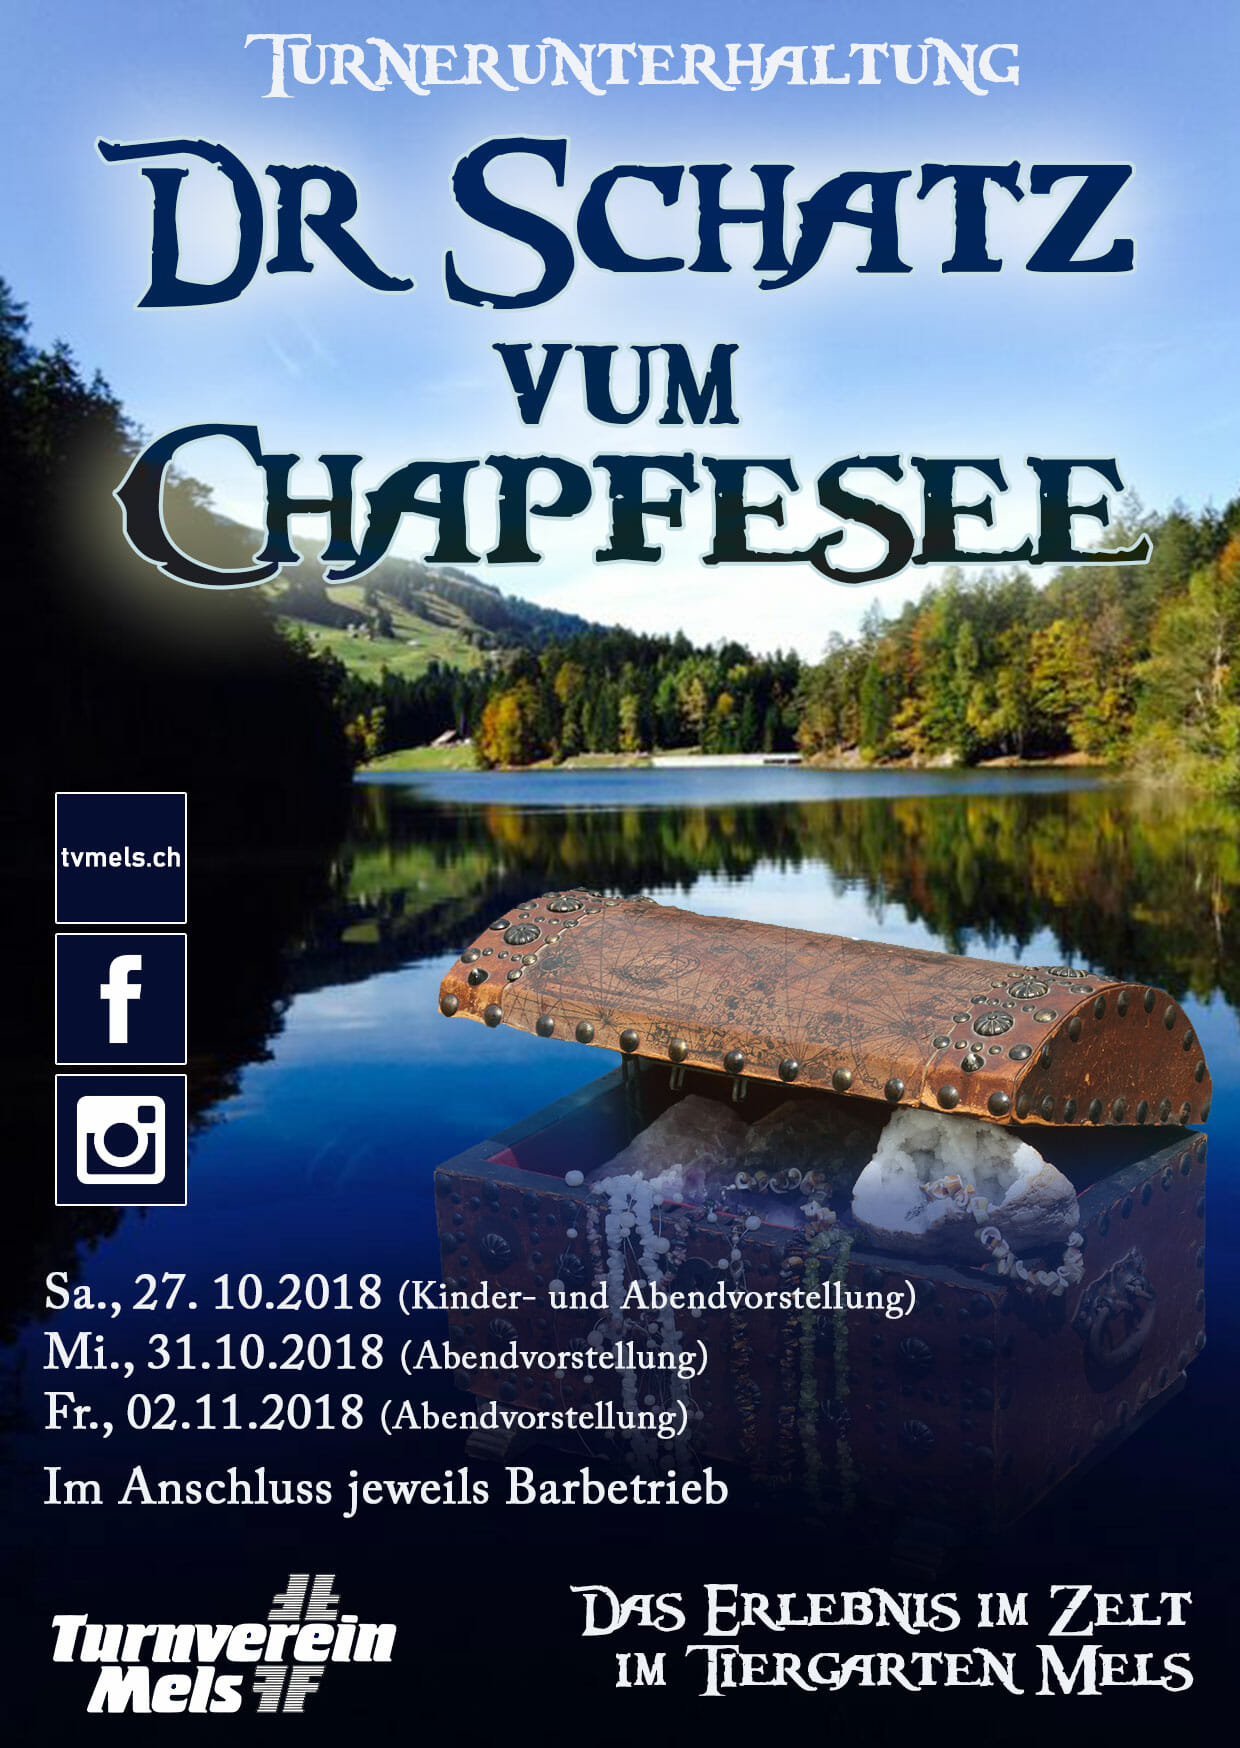 Turnerunterhaltung 2018 - Dr Schatz Vum Chapfesee